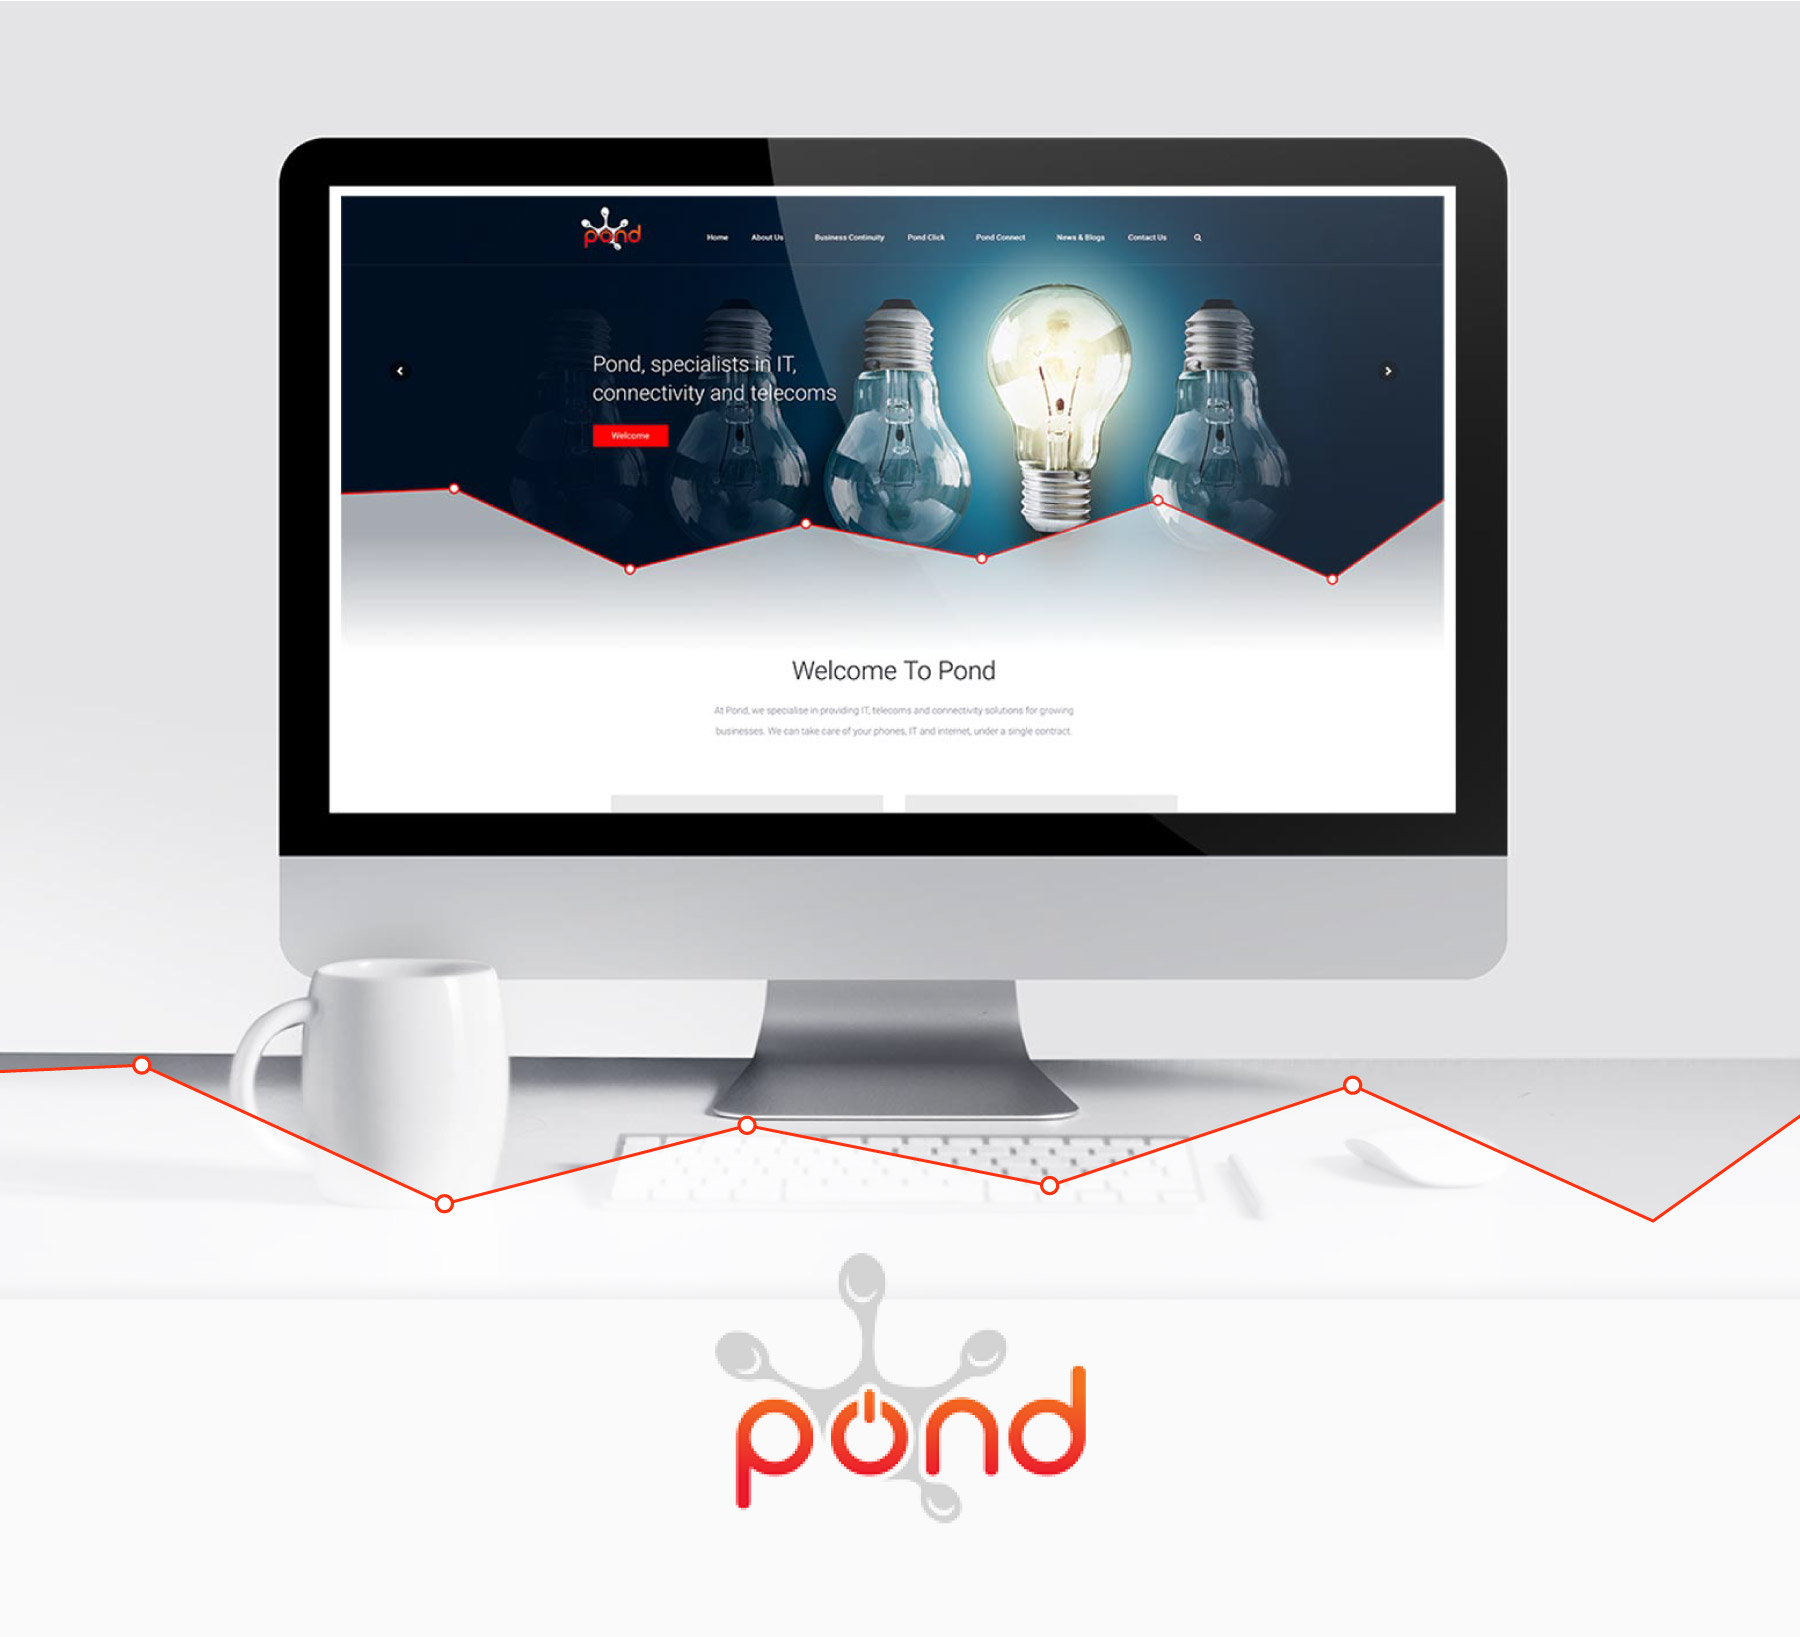 POND-blog-graphic_new-website